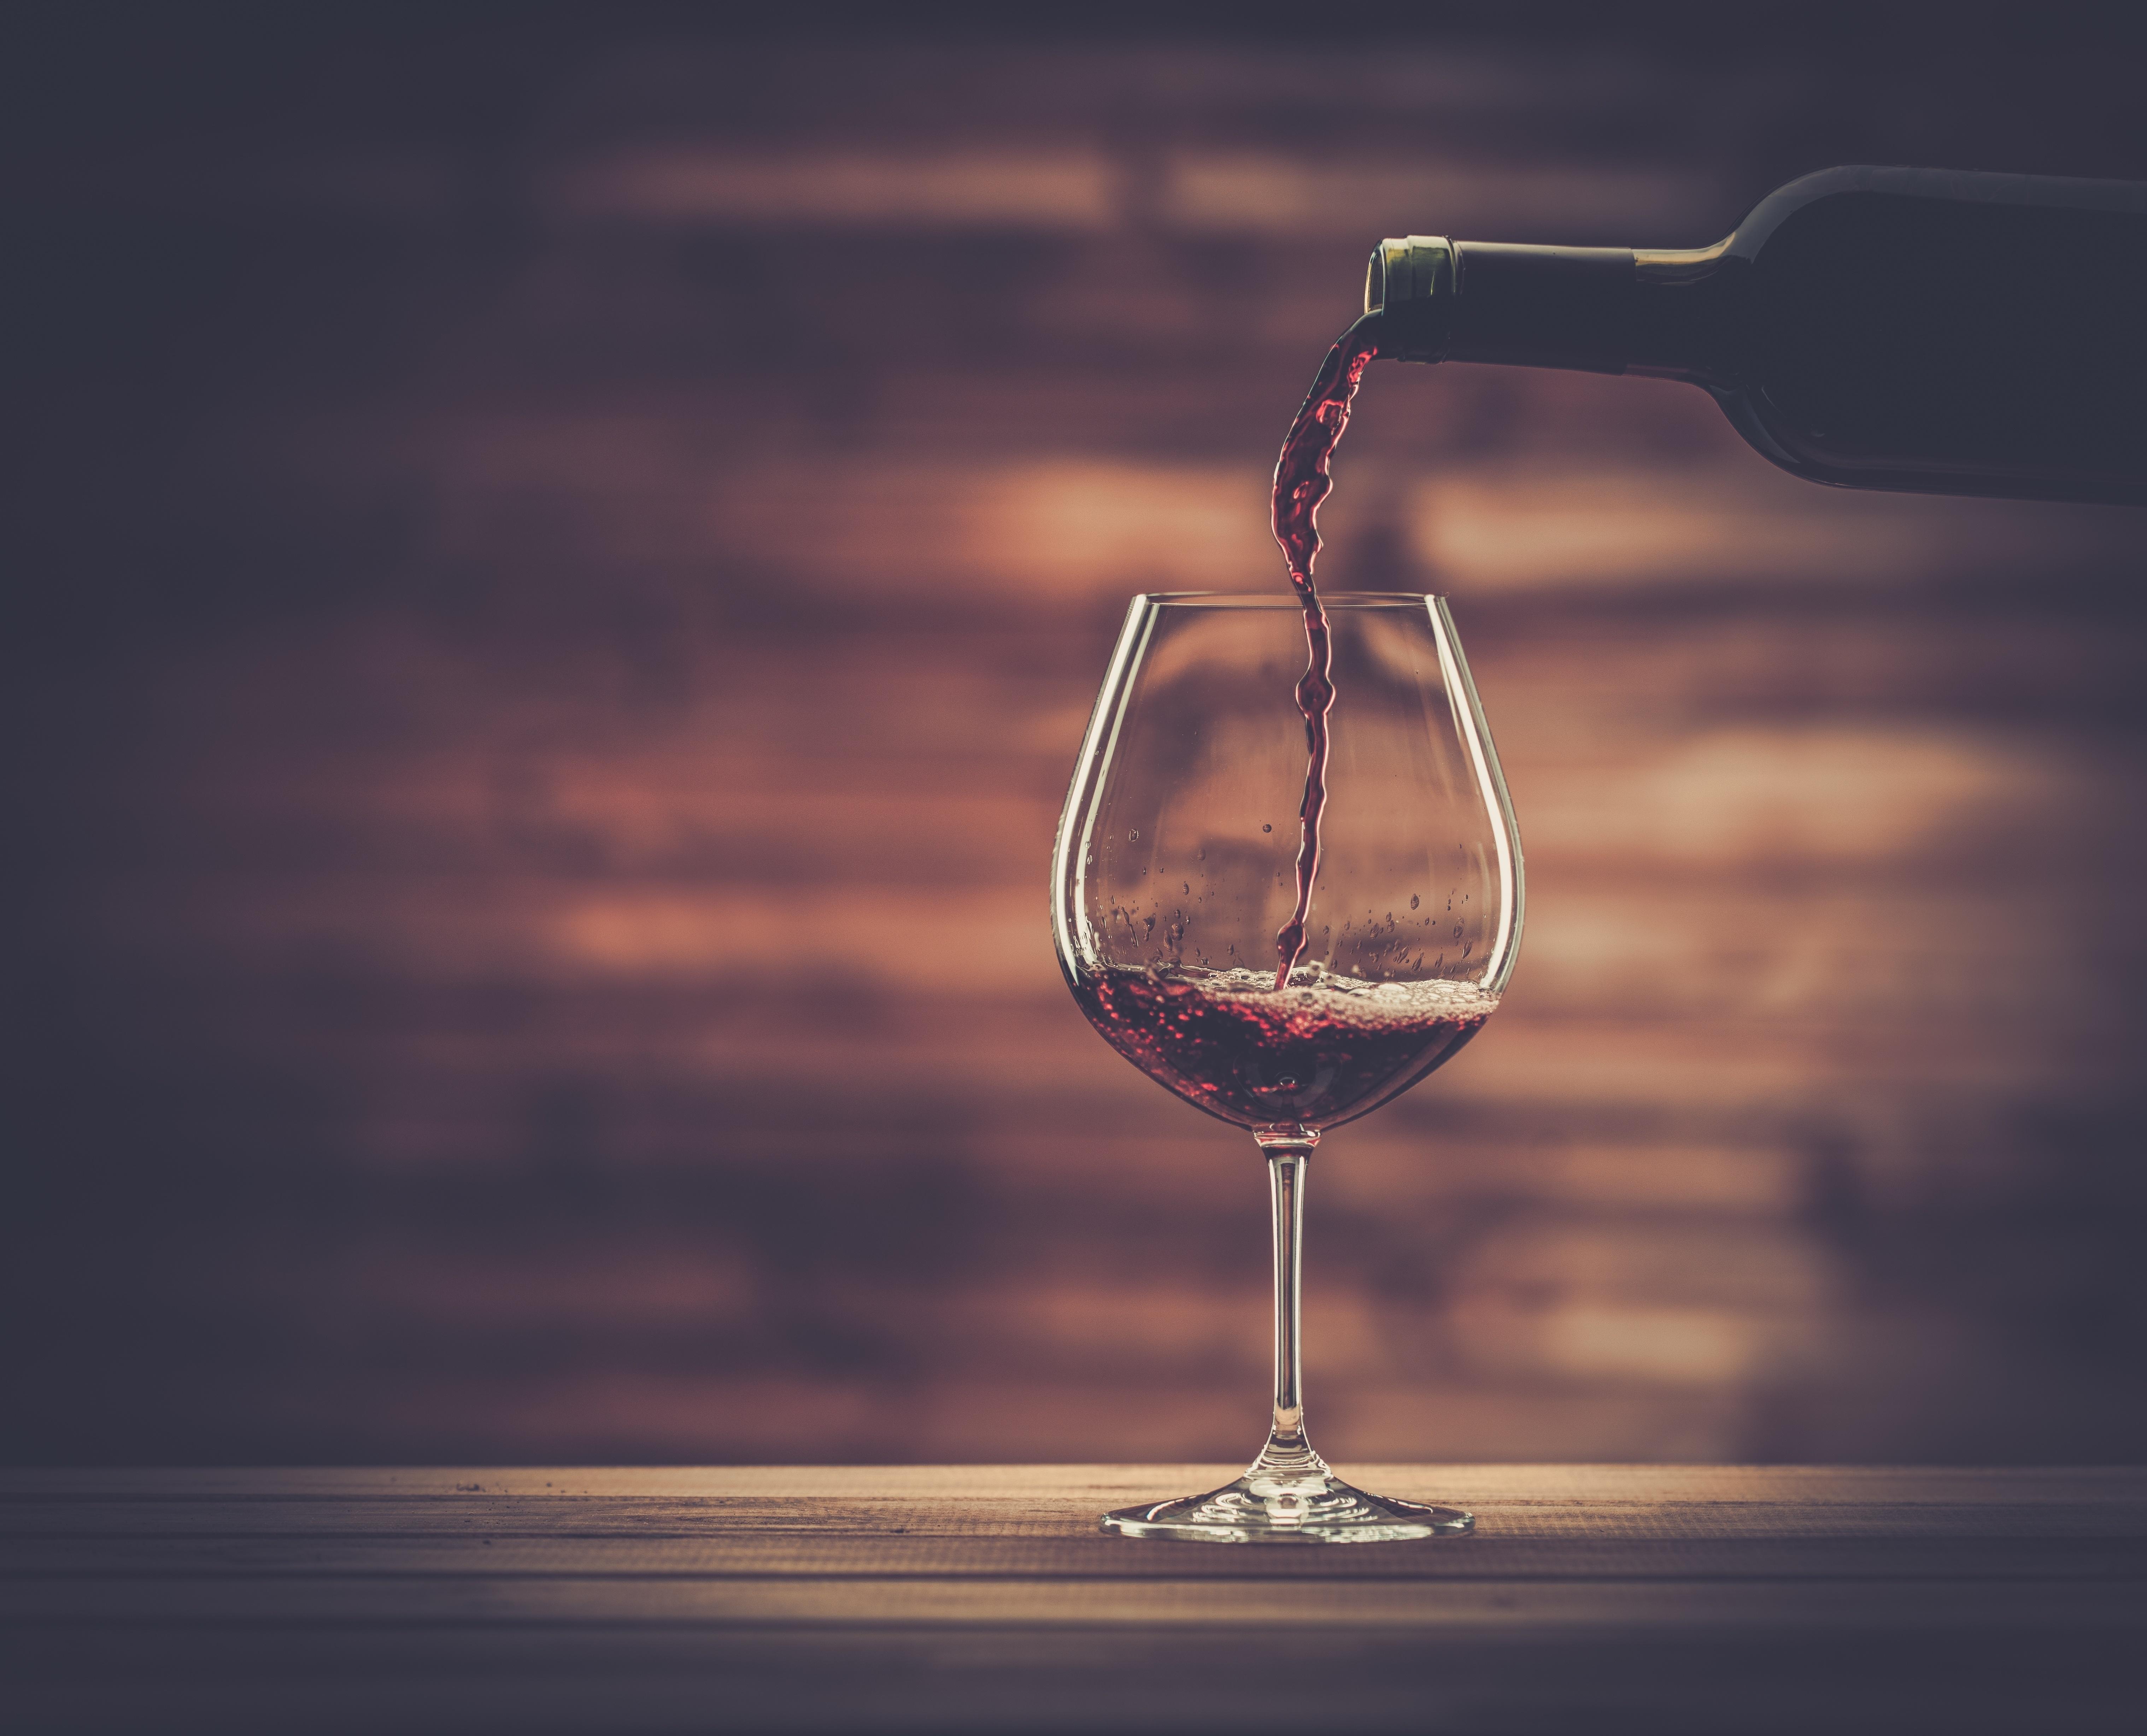 oregon winery license